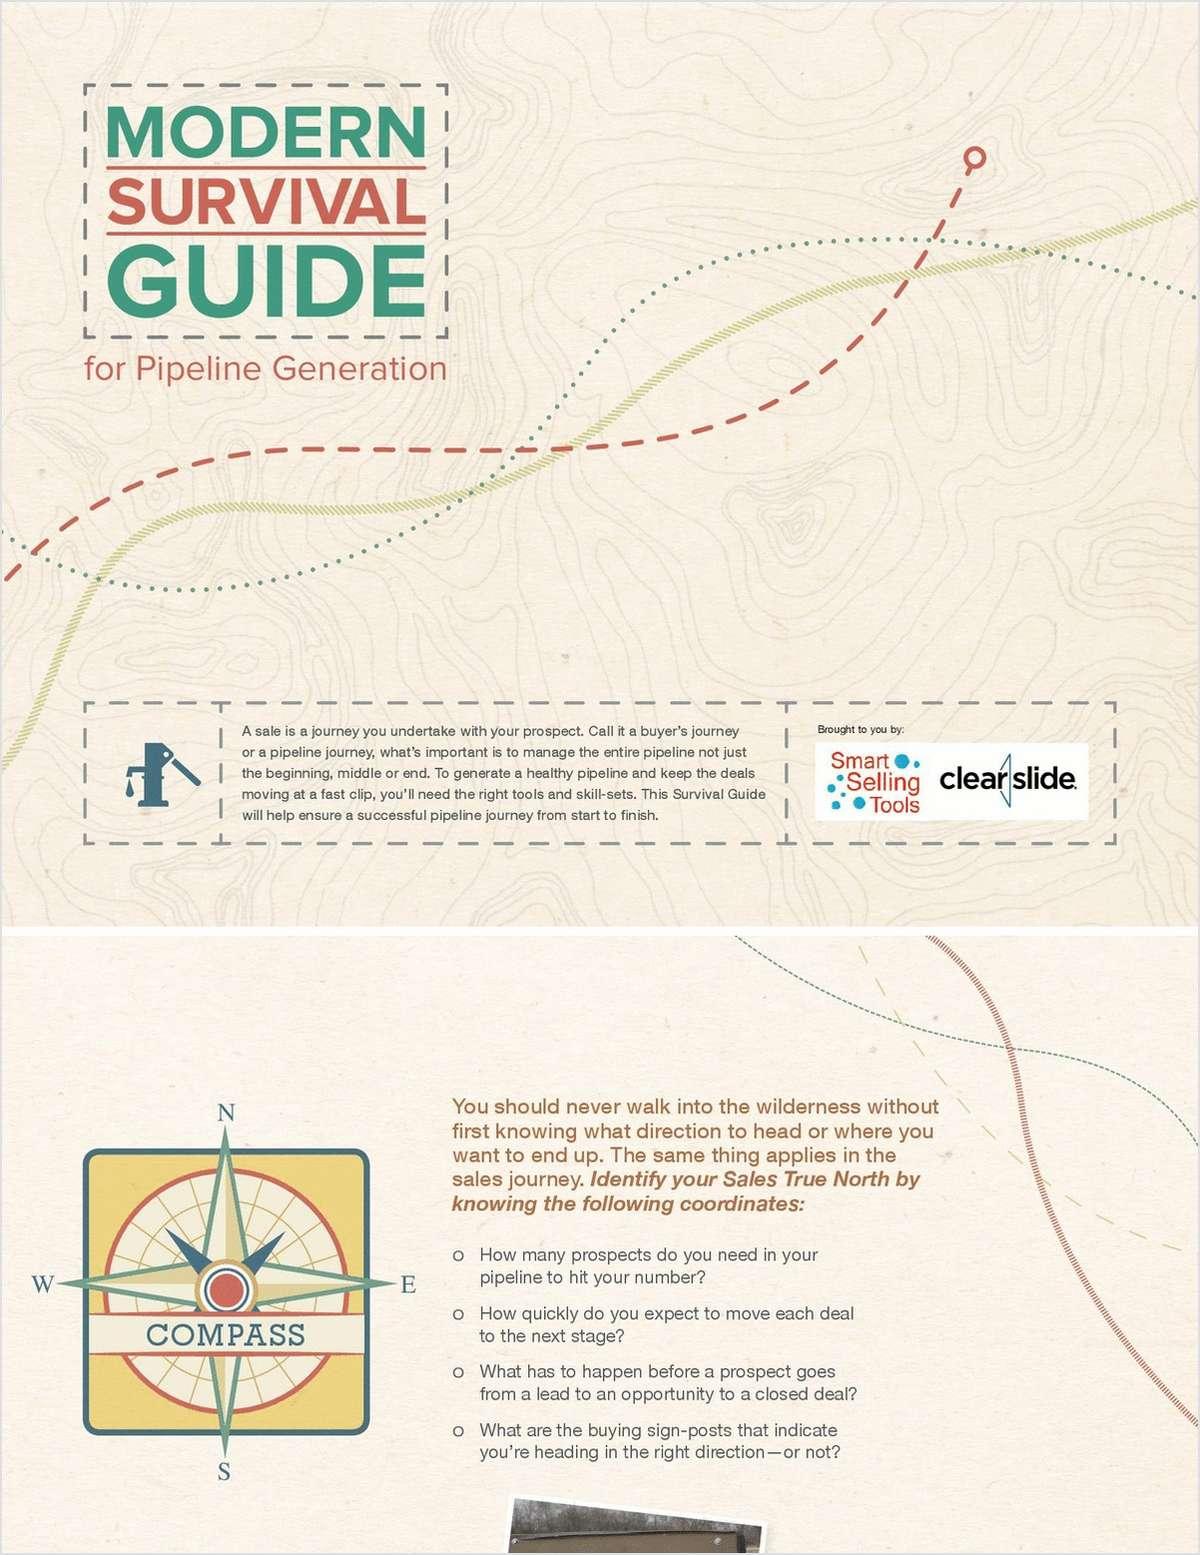 Modern Survival Guide for Pipeline Generation